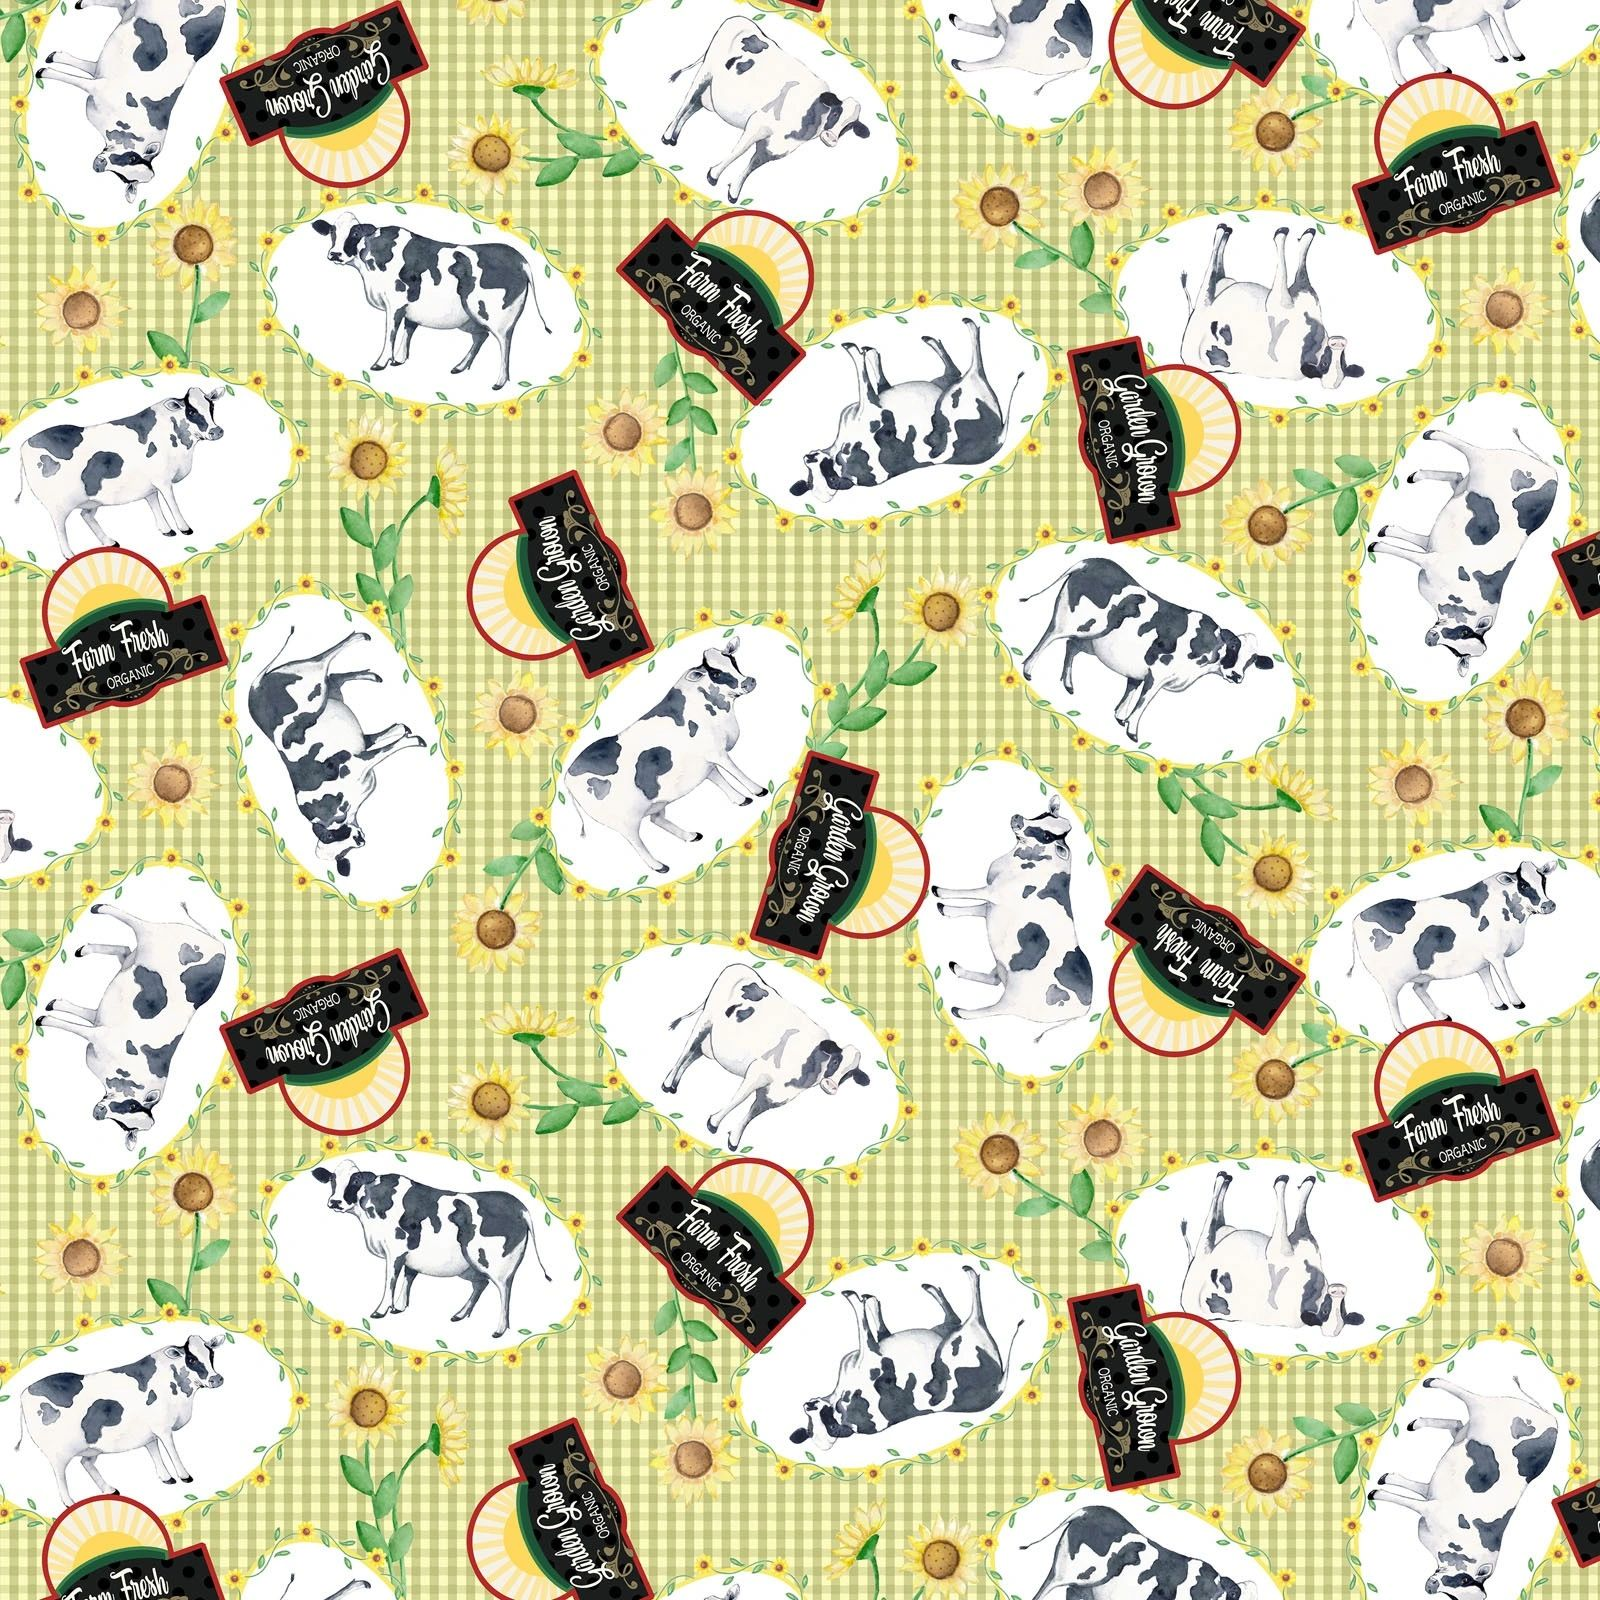 Cows on Plaid Green Rise N Shine Digital Print 100% Cotton